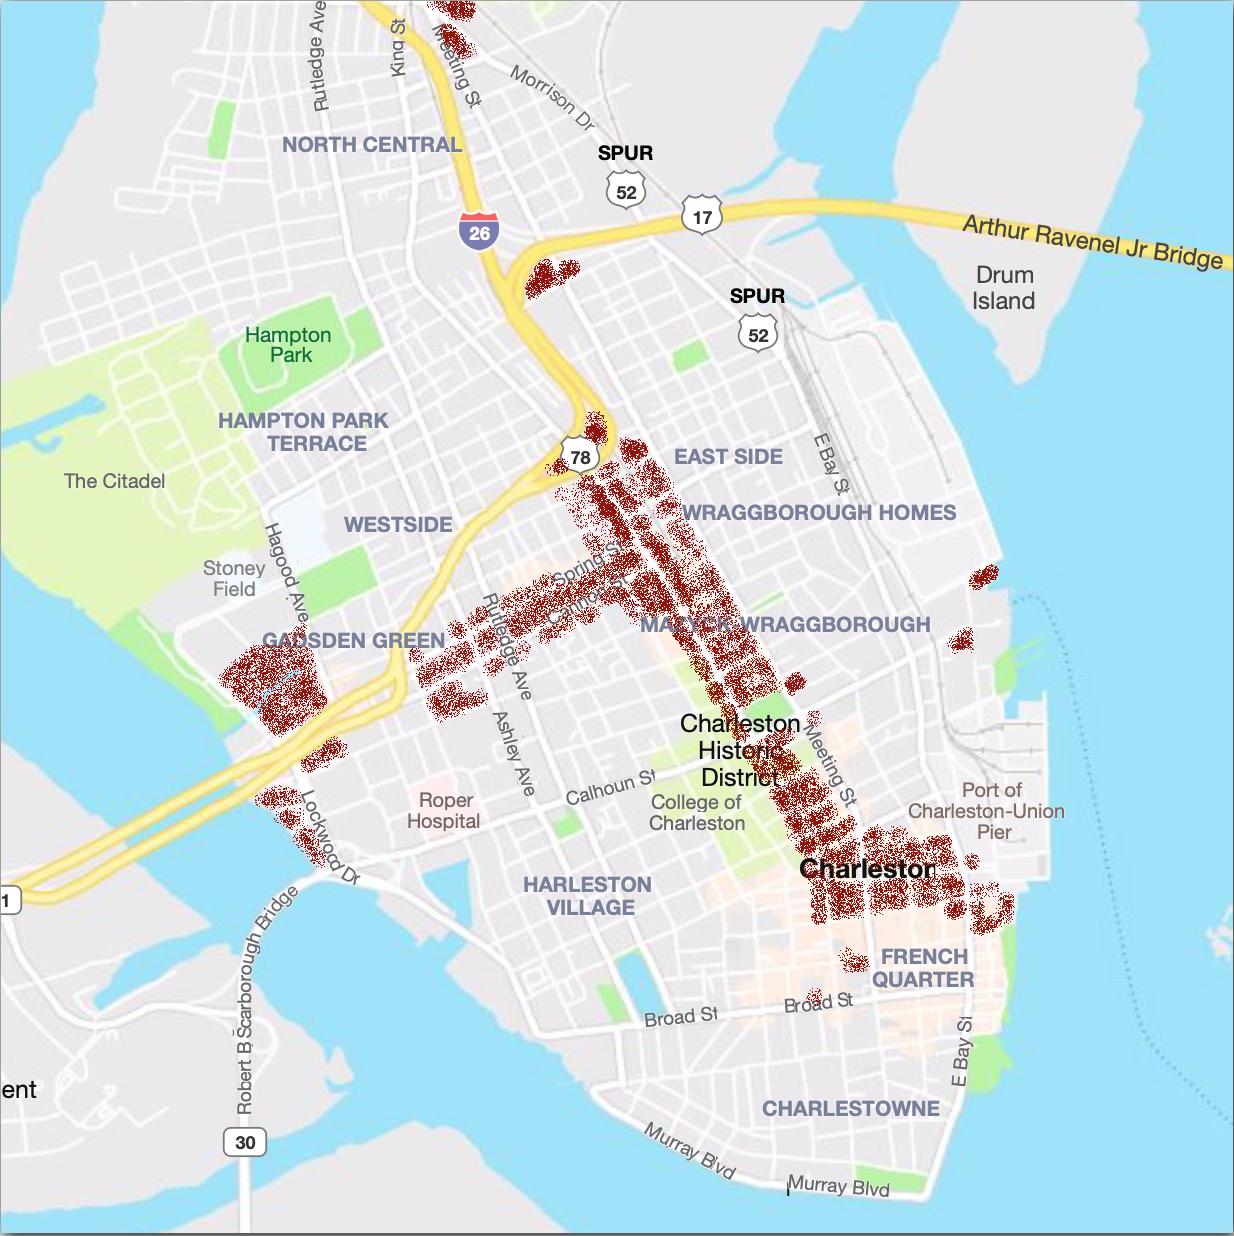 Short Term Rentals In Charleston: Buying One